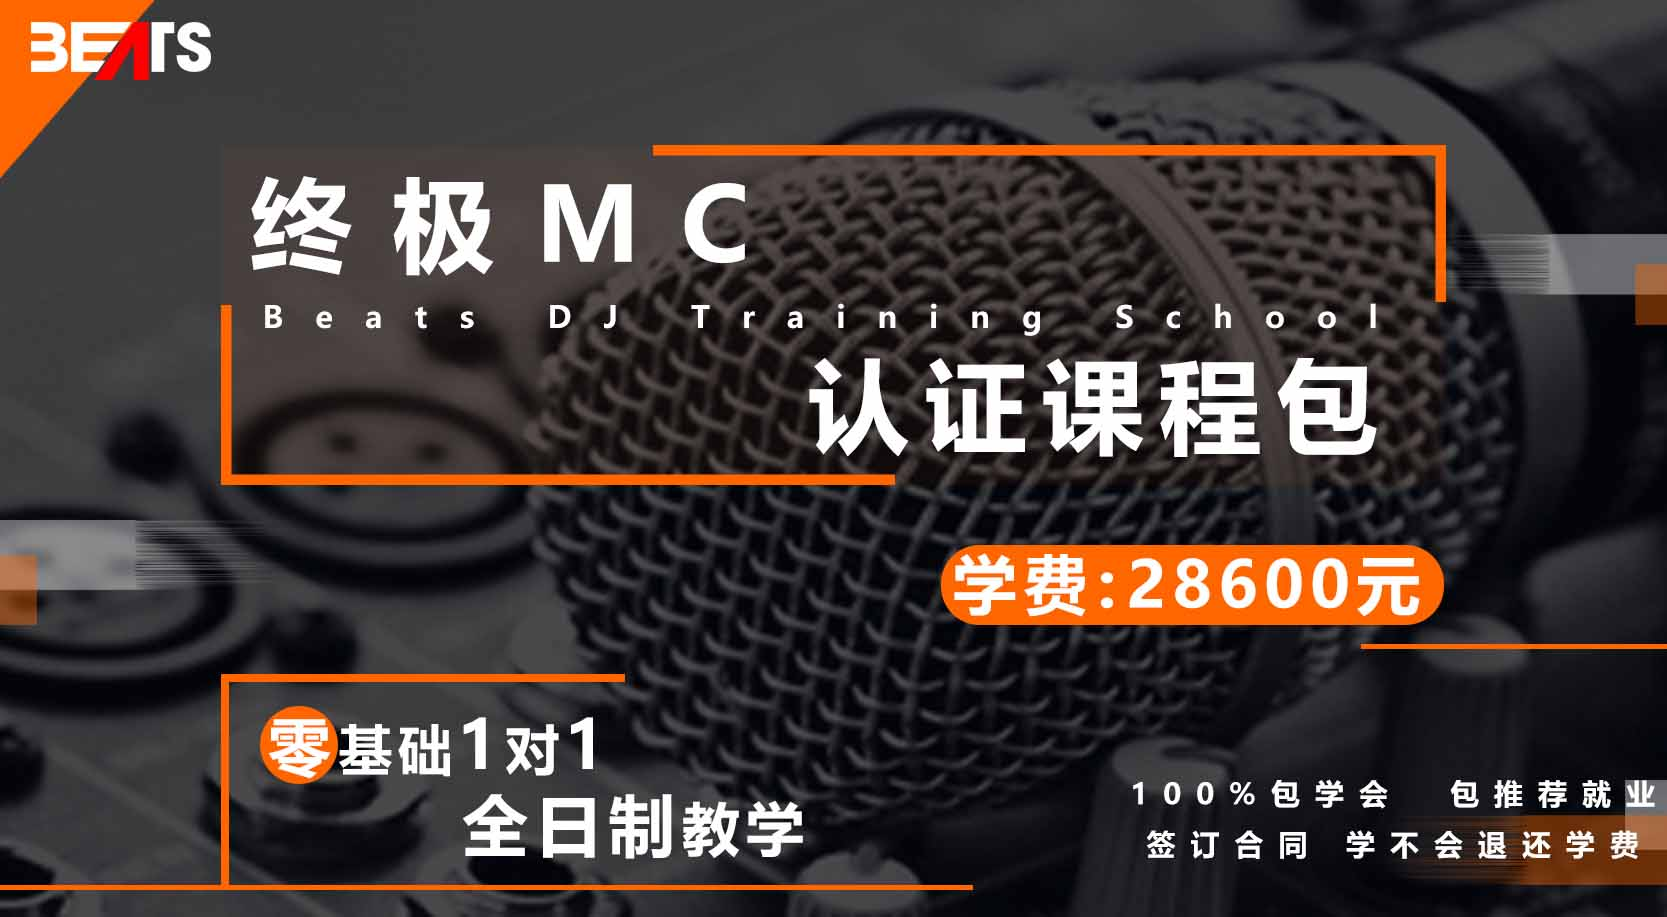 BEATS DJ厂牌 MC终极认证课程包